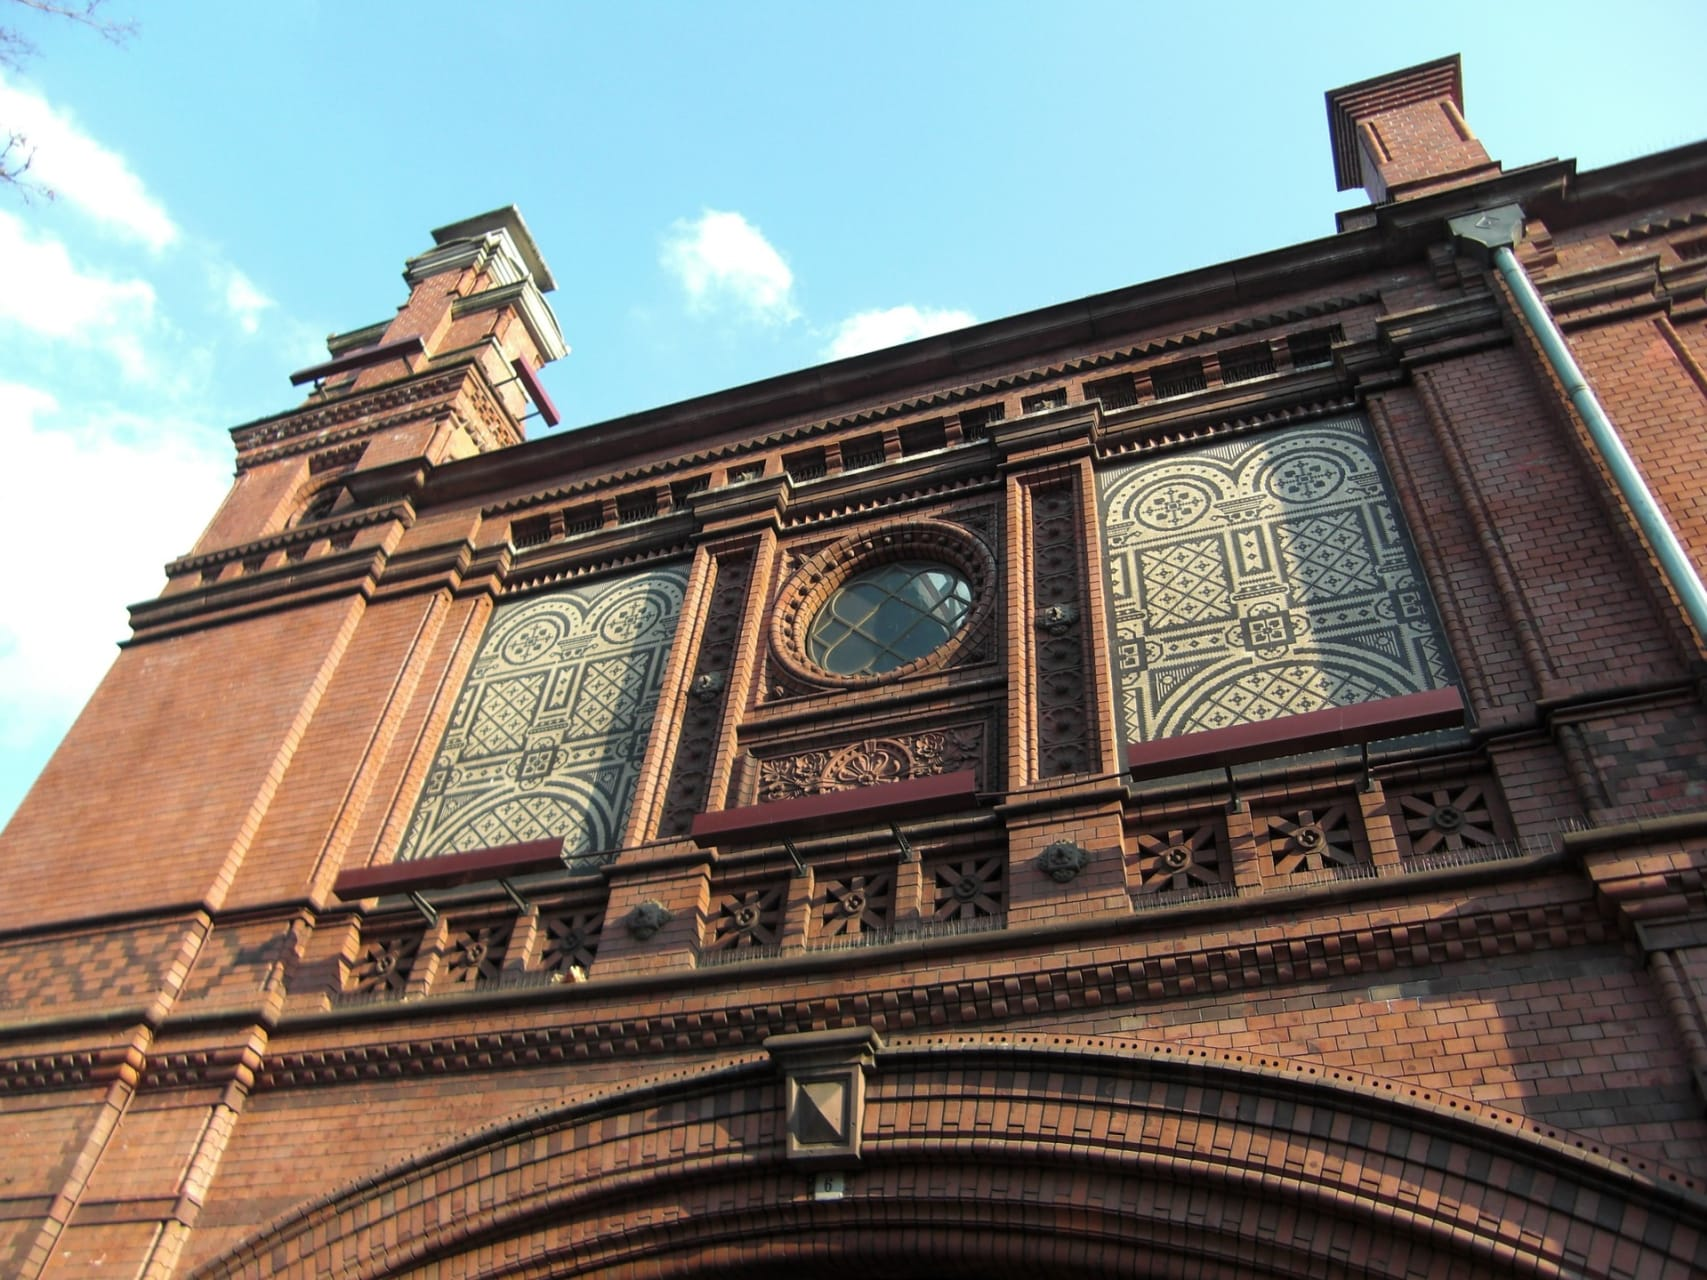 Berlin - Jewish Heritage, Part 2